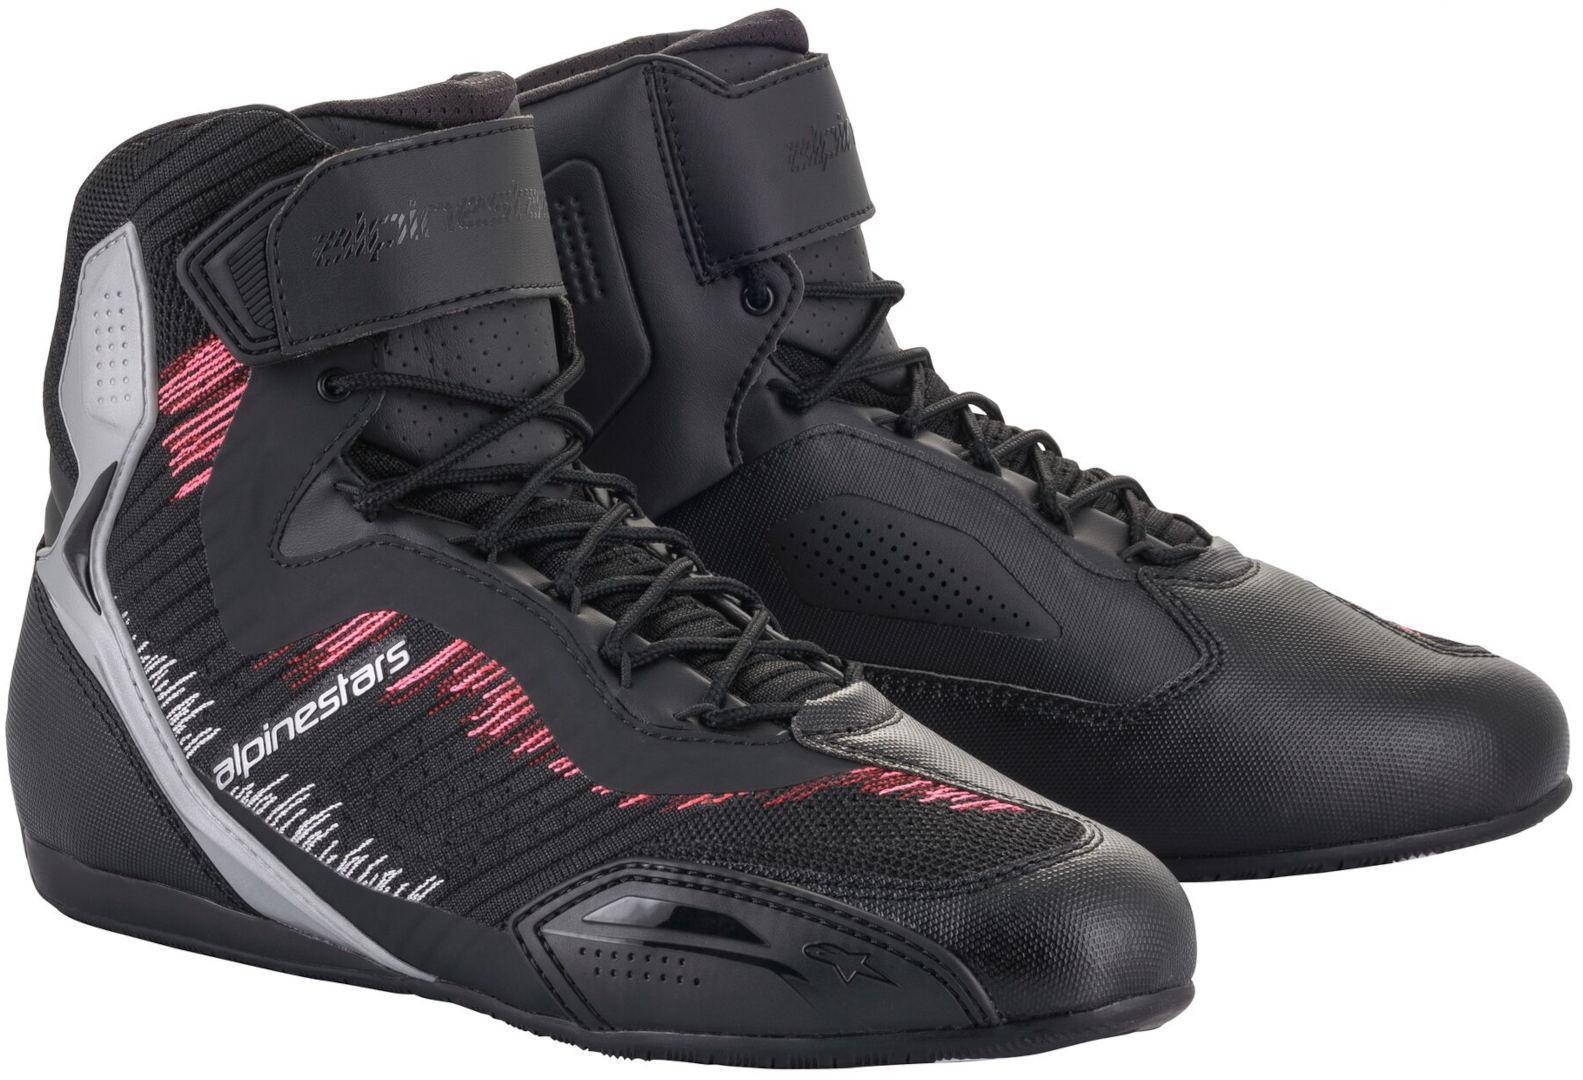 Alpinestars Stella Faster-3 Rideknit Chaussures de moto dames Noir Gris Rose taille : 38 39